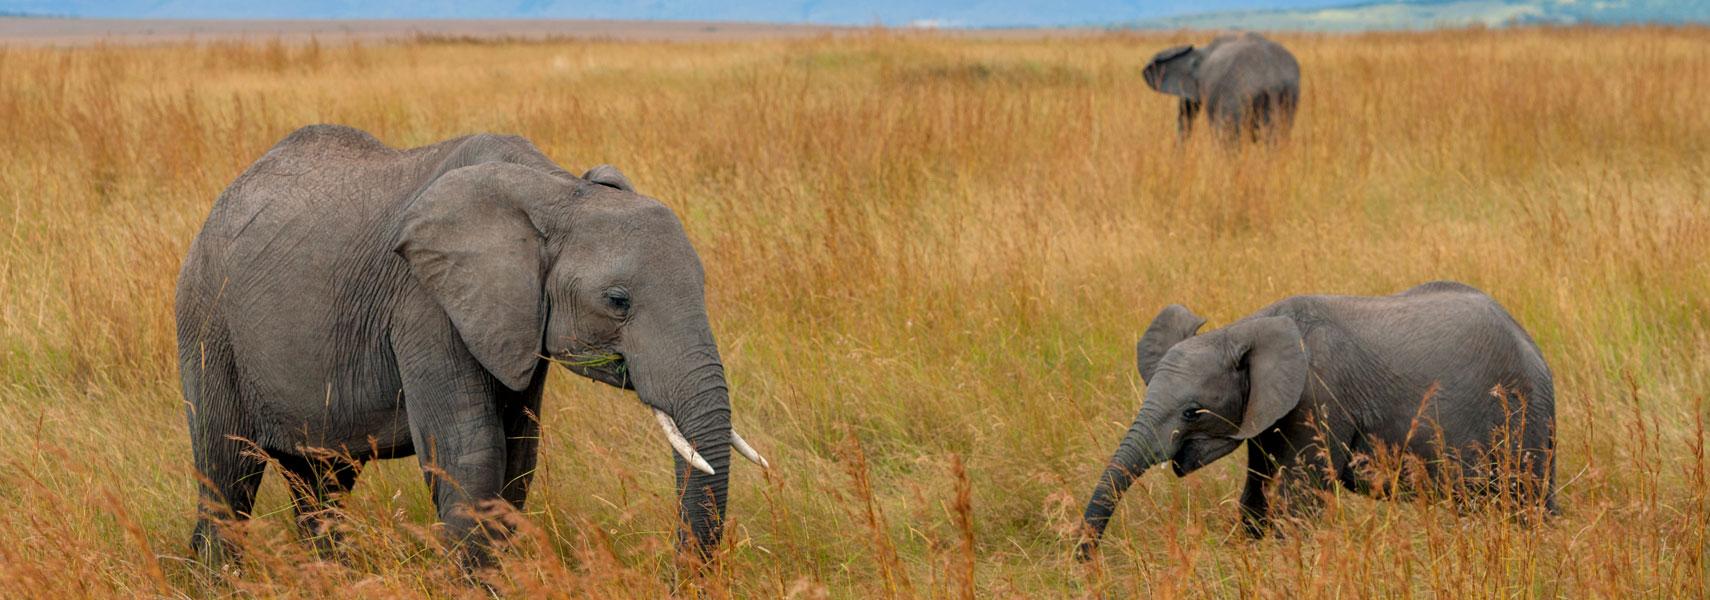 taita-hills-elefanti